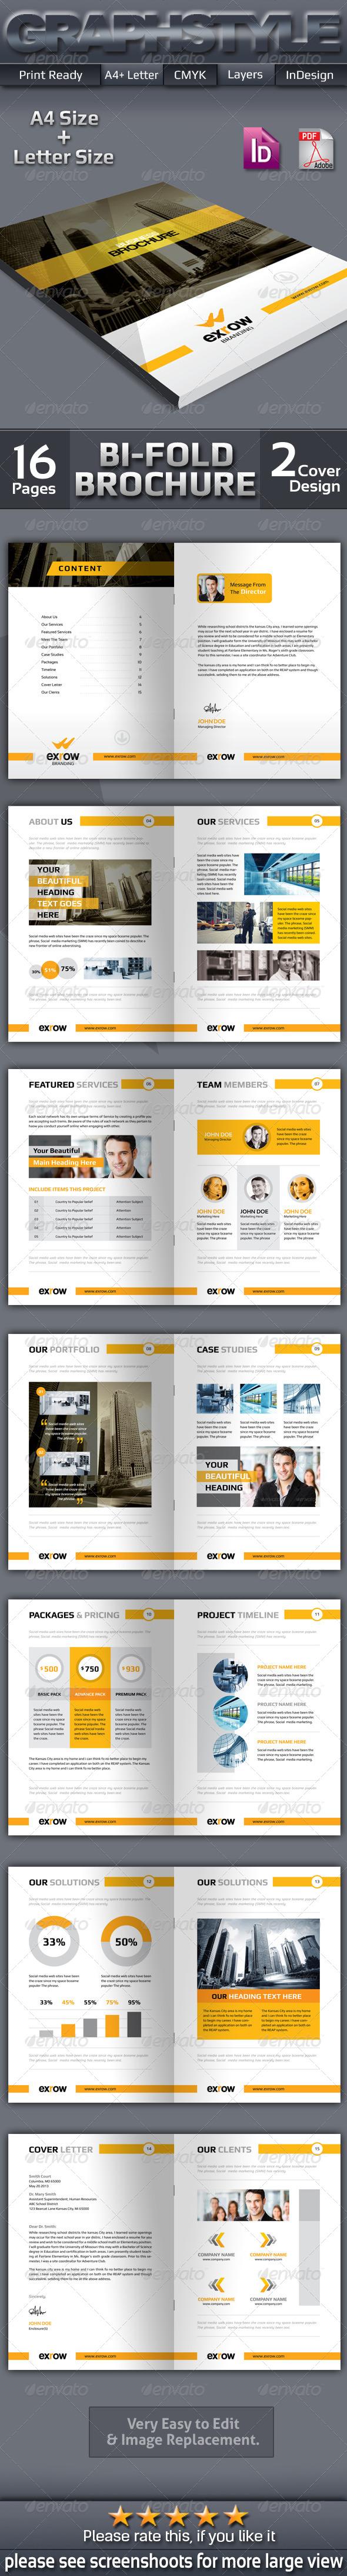 Exrow Business Bi-Fold Brochure